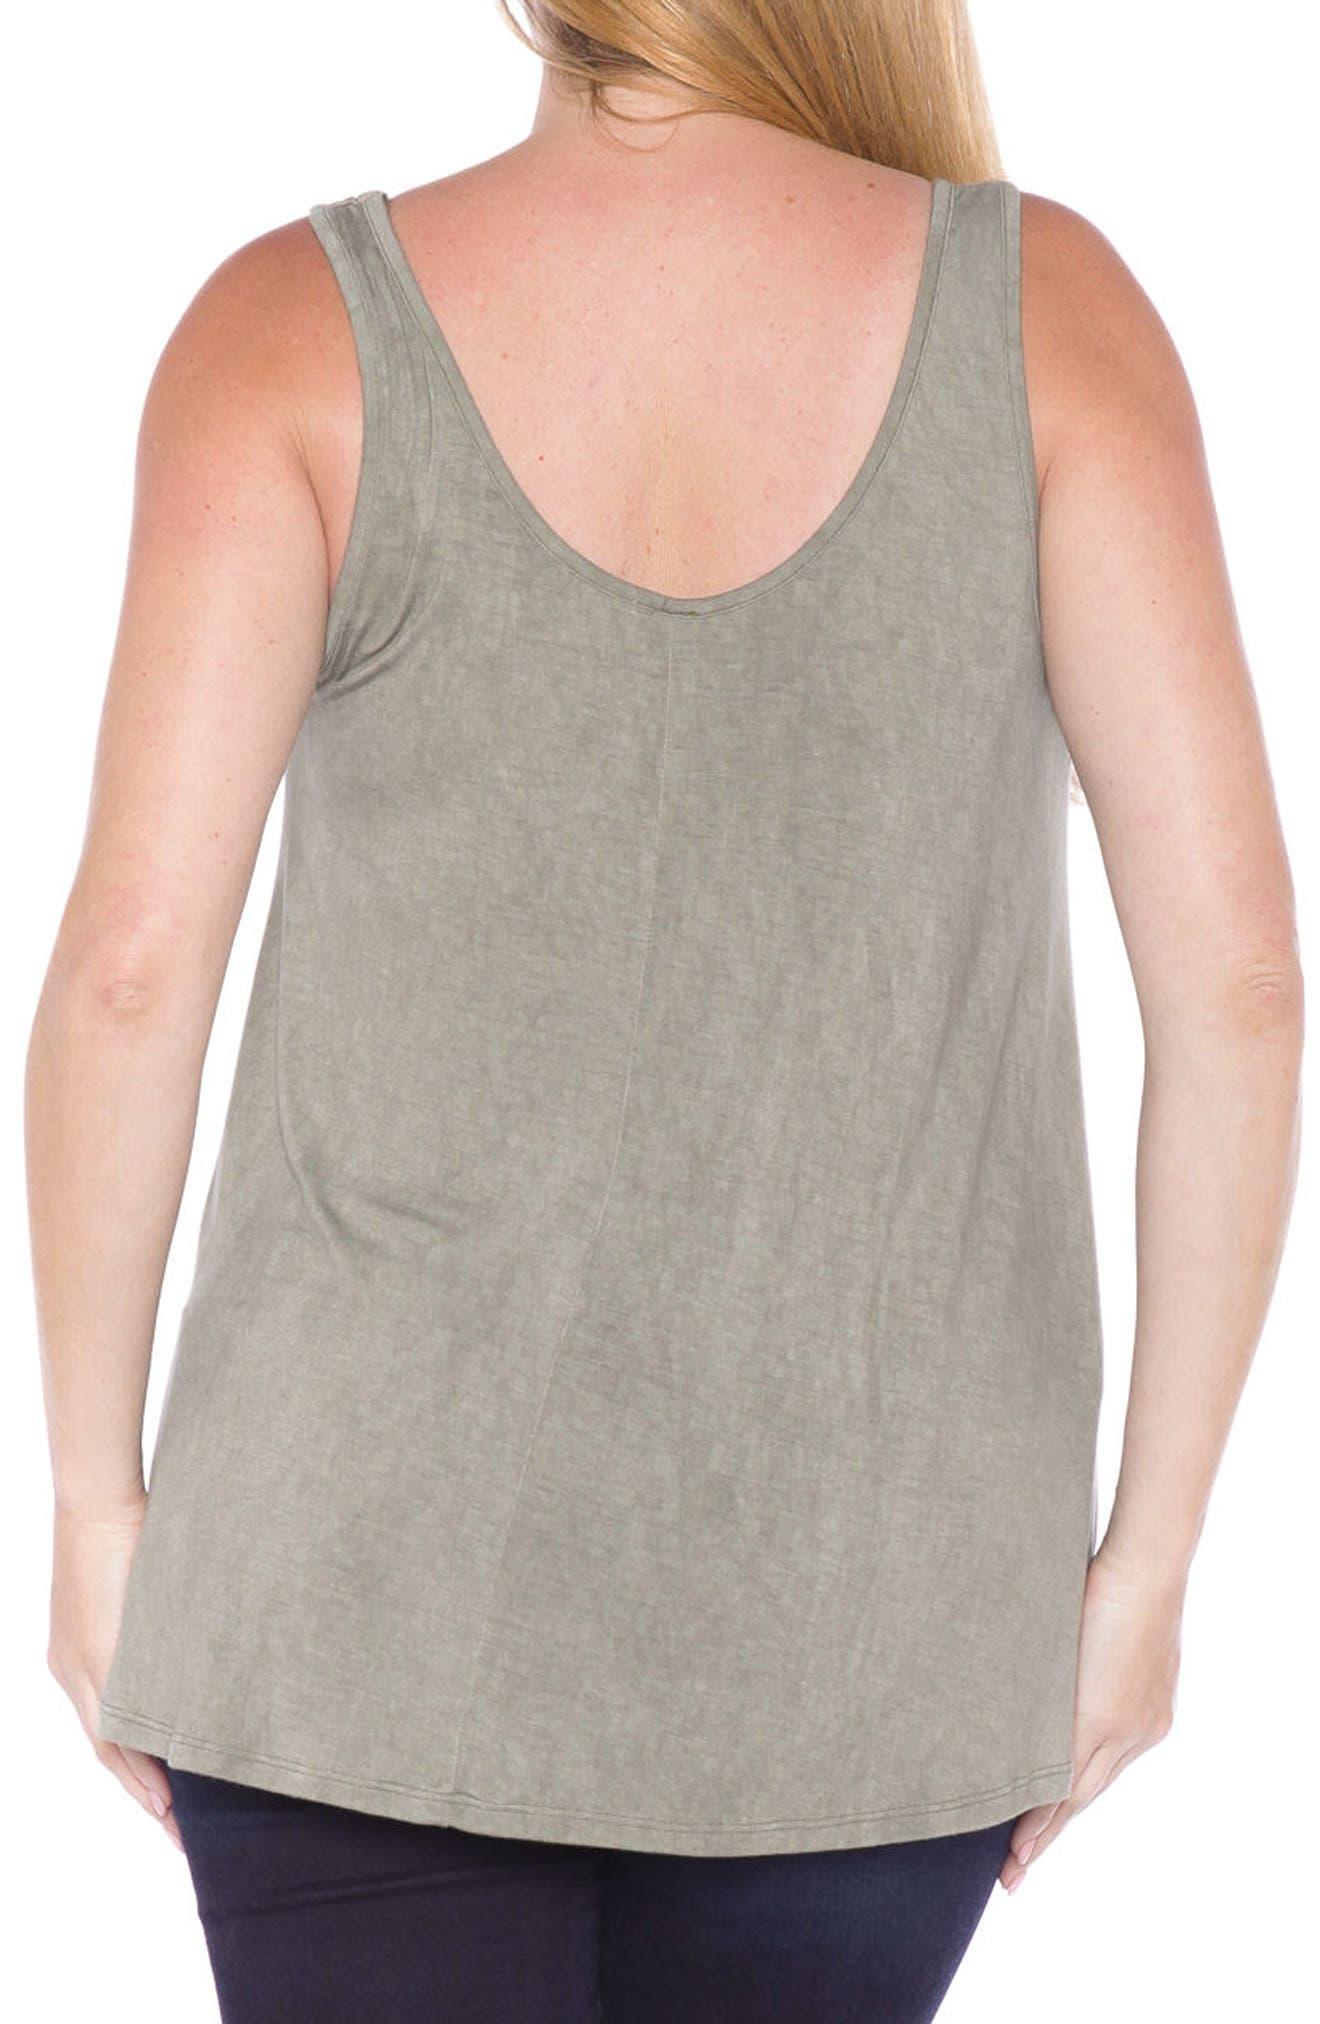 Alternate Image 2  - SLINK Jeans Scoop Neck Tank Top (Plus Size)